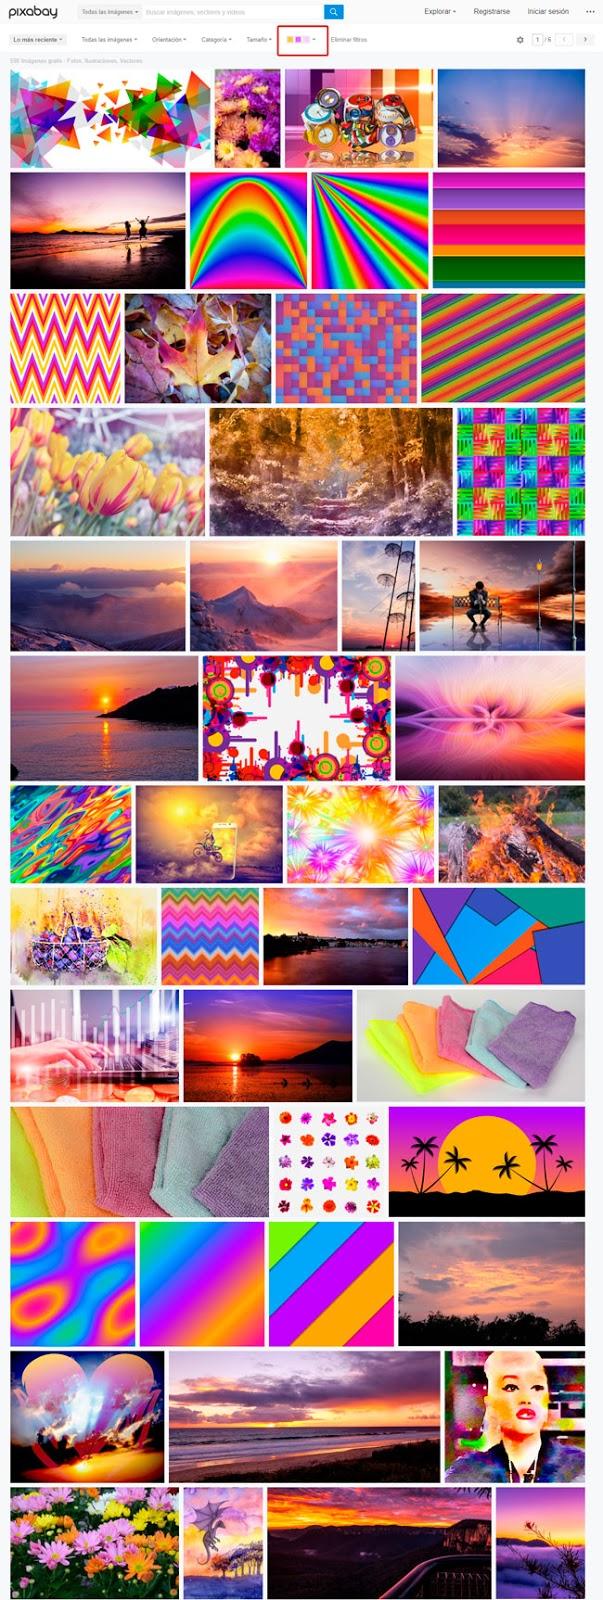 colores_pixabay